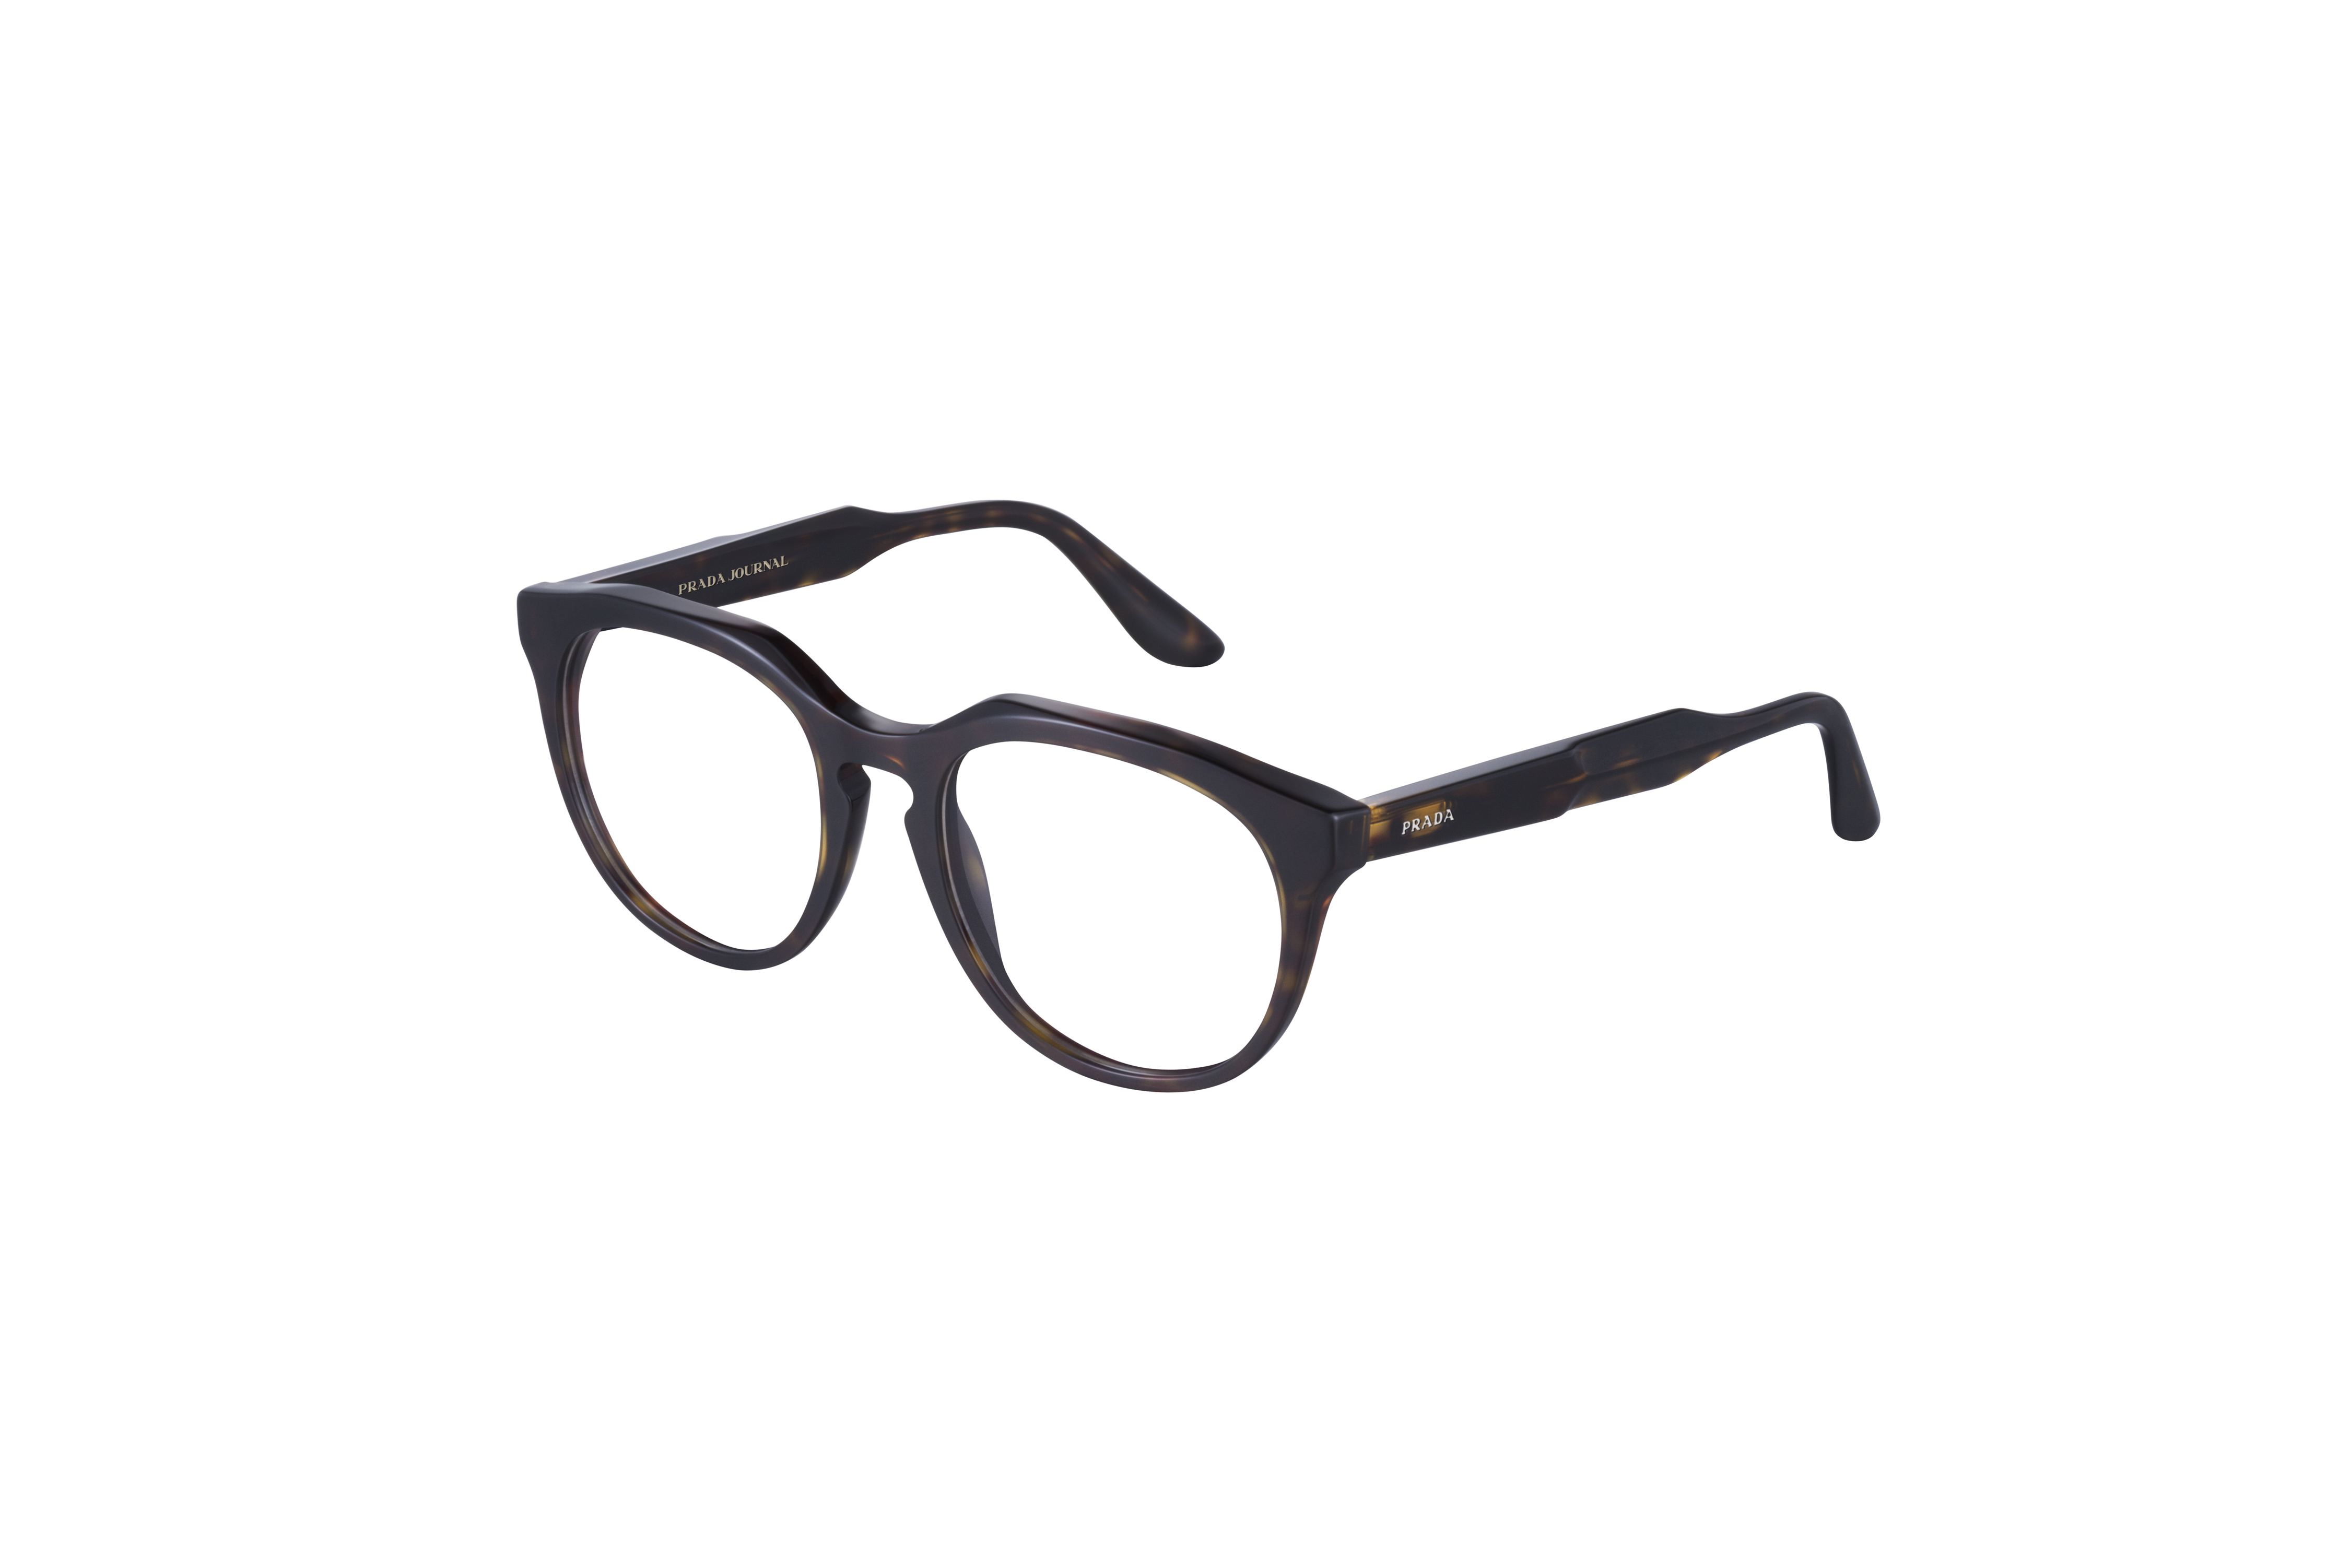 Prada Glasses Frame 2015 : Spring/Summer 2015 Prada Eyewear Collection Identity ...